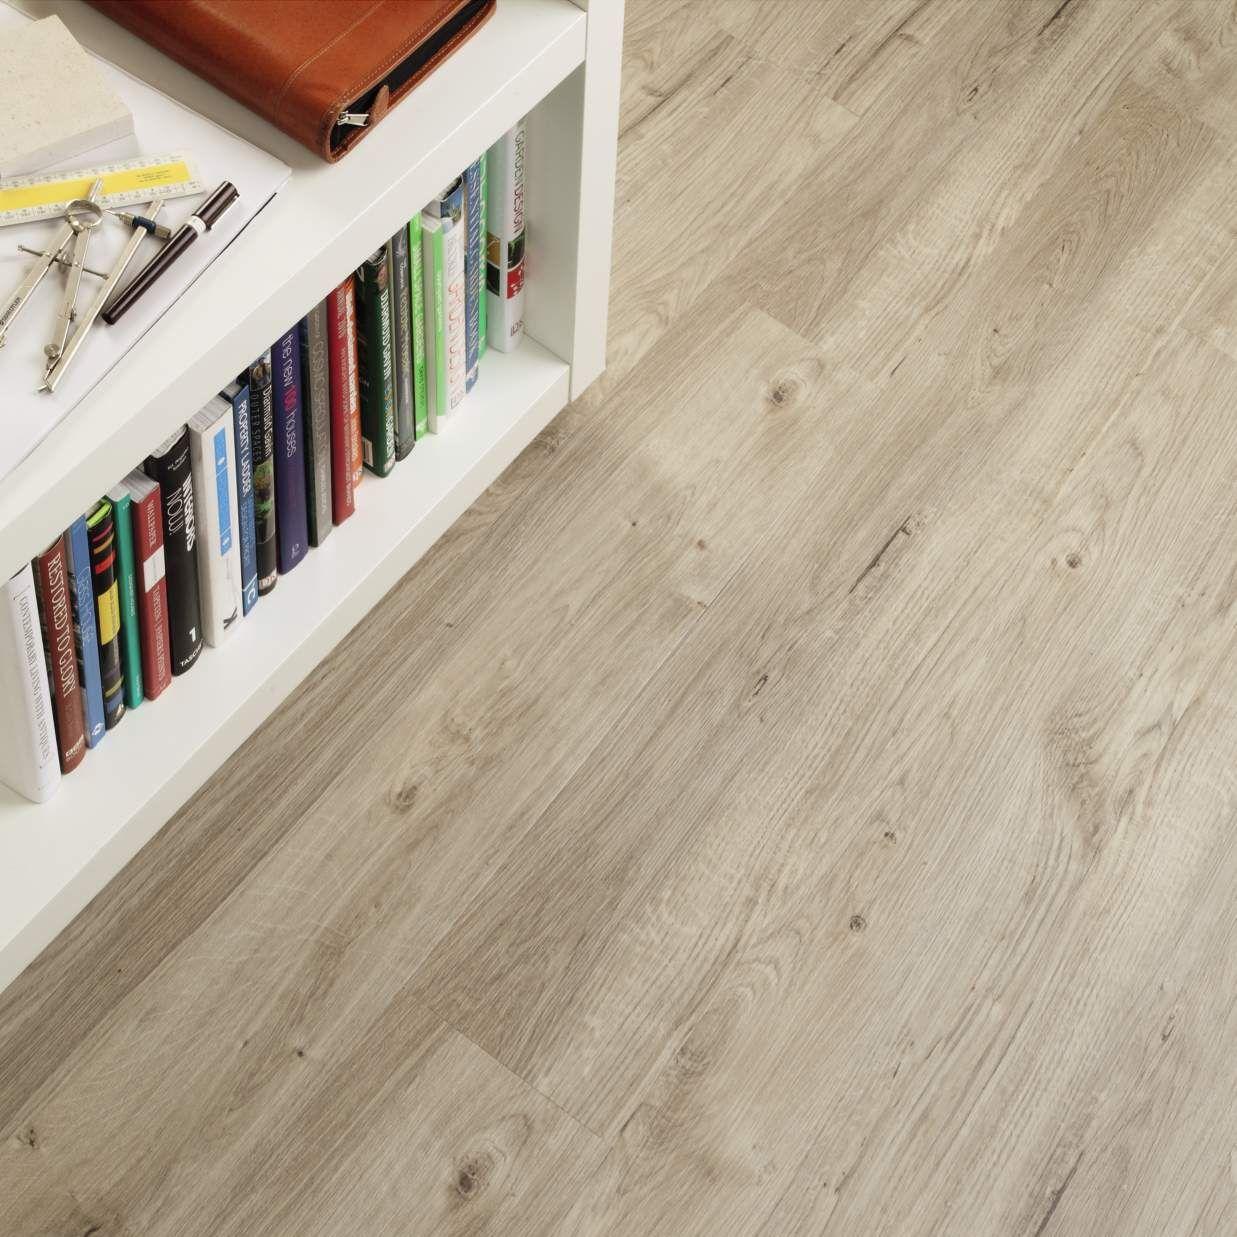 Pvc flooring commercial tile smooth spacia sun bleached pvc flooring commercial tile smooth spacia sun bleached oak ss5w2531 dailygadgetfo Choice Image